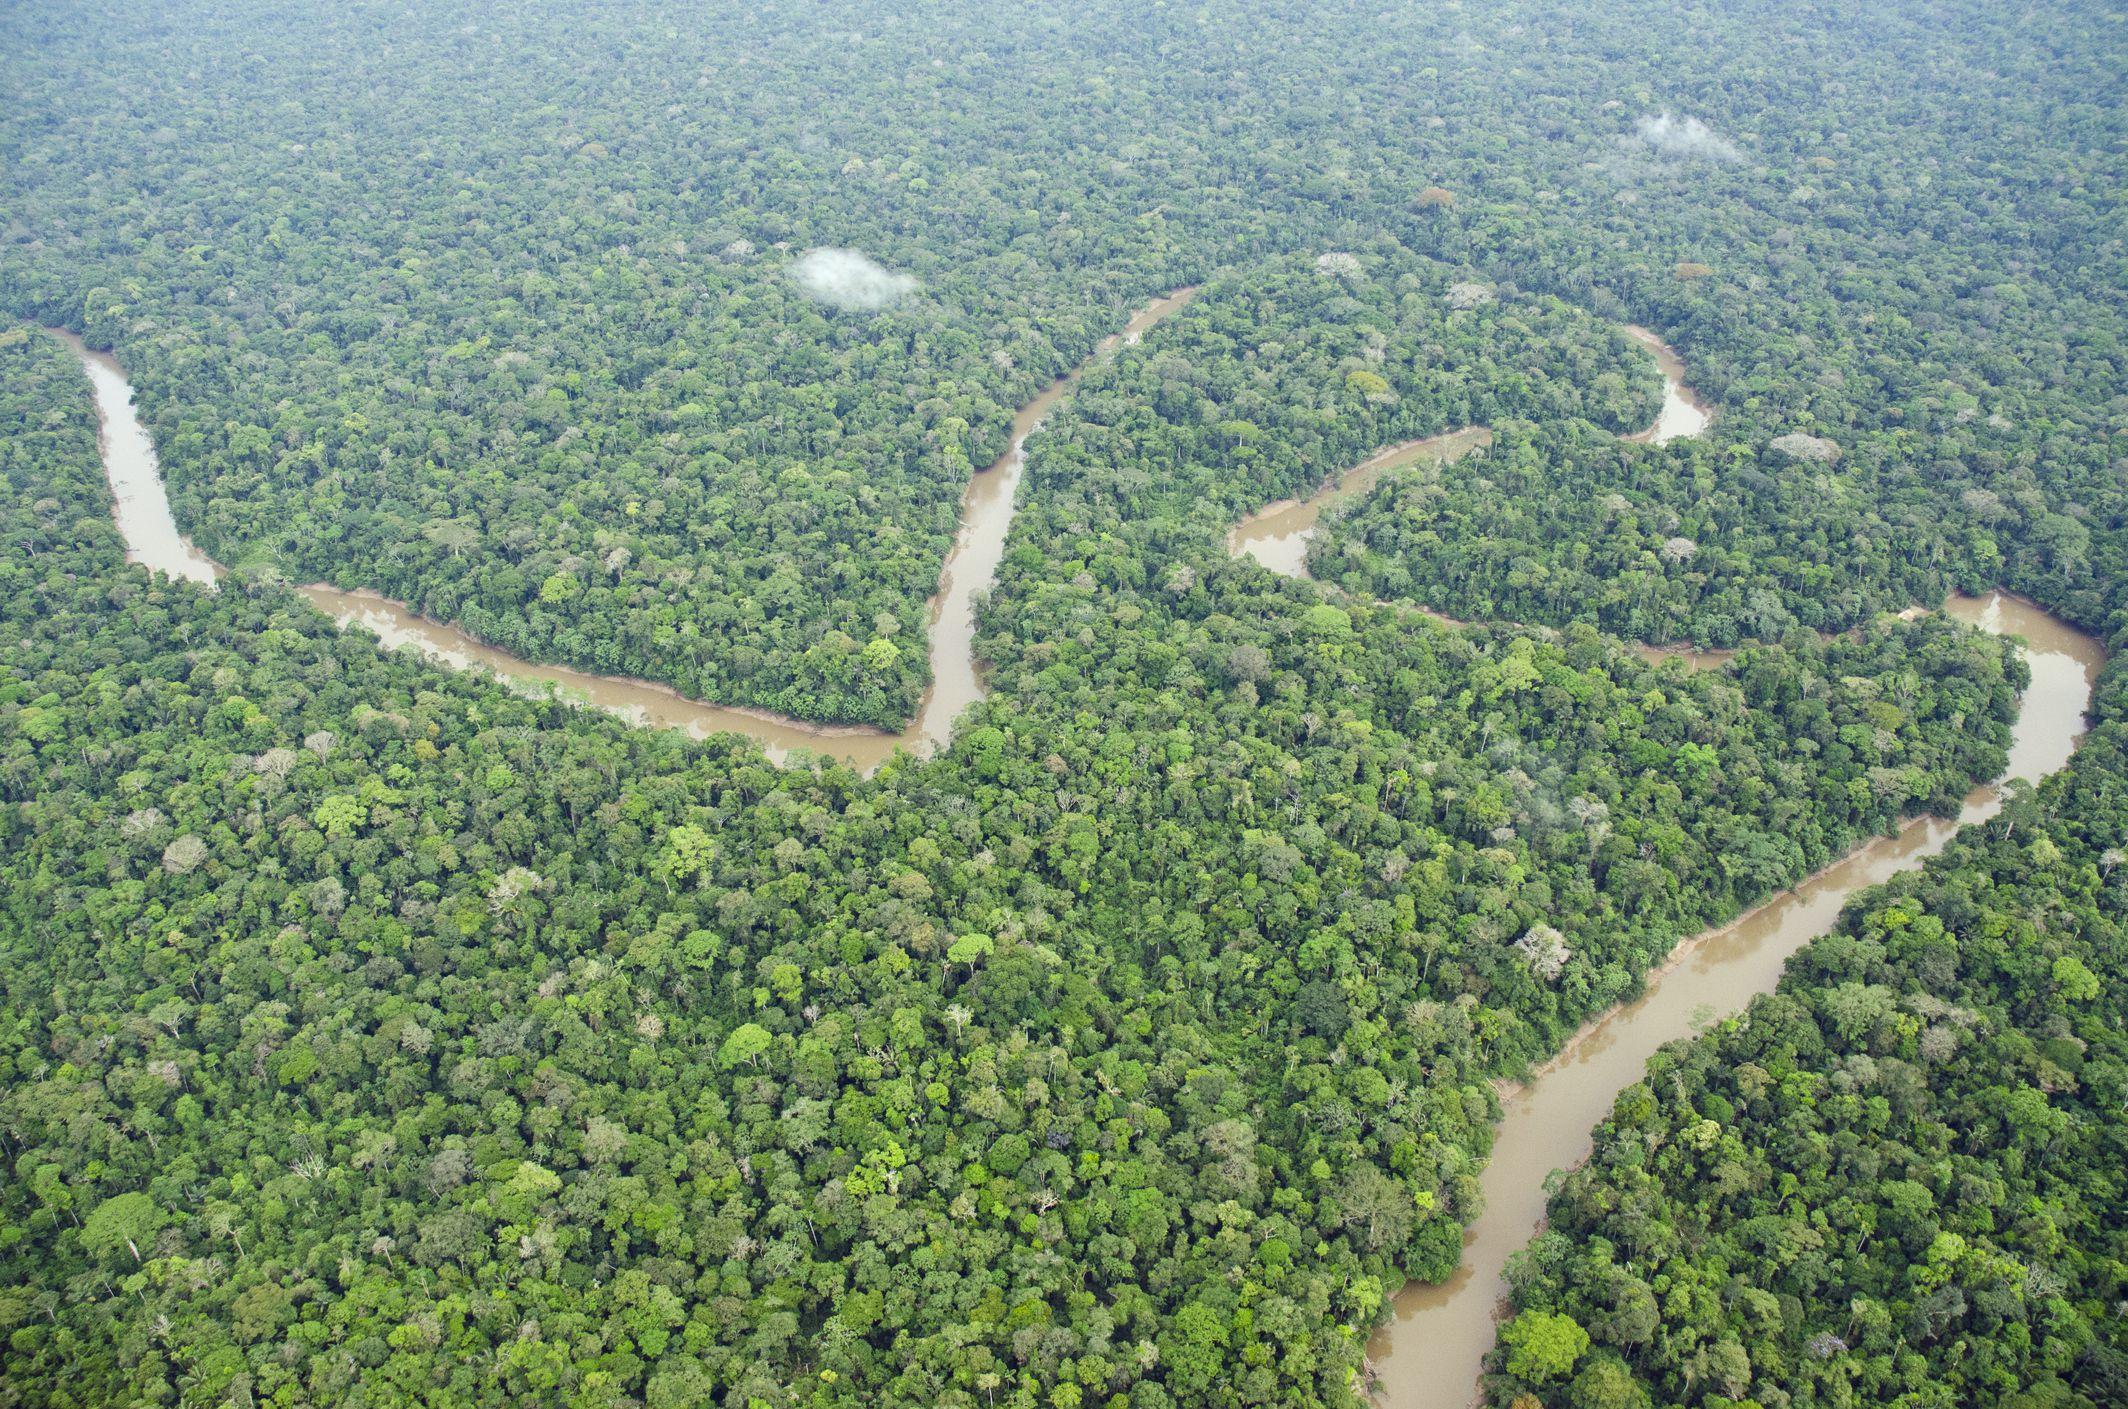 Río Tiputini y selva tropical, Parque Nacional Yasuní, selva amazónica, Ecuador, América del Sur